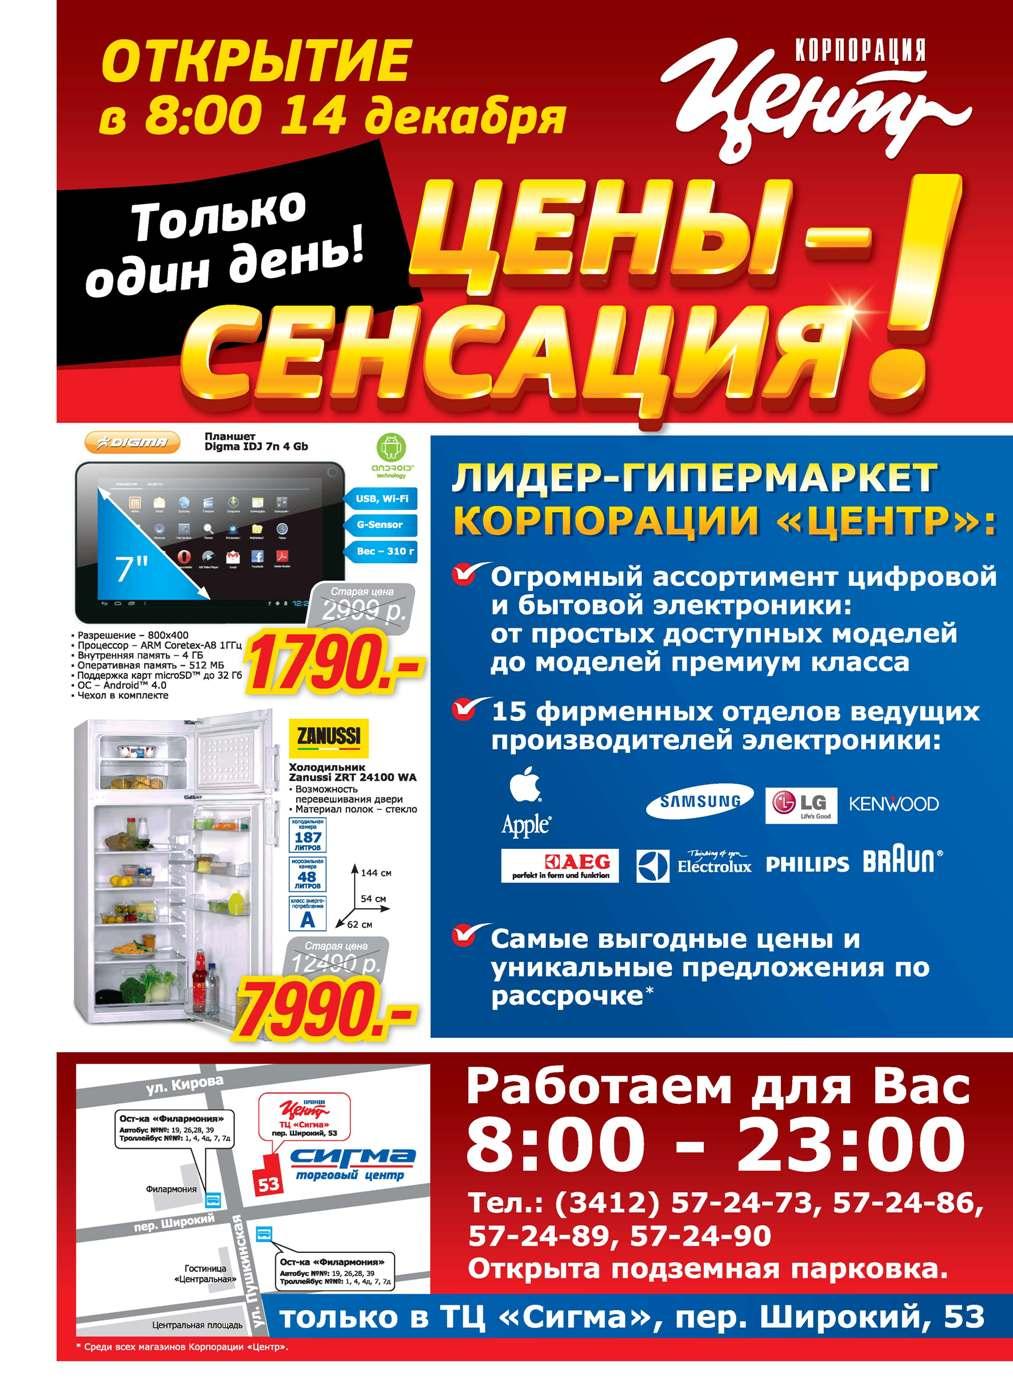 Корпорация Центр Ижевск Интернет Магазин Каталог